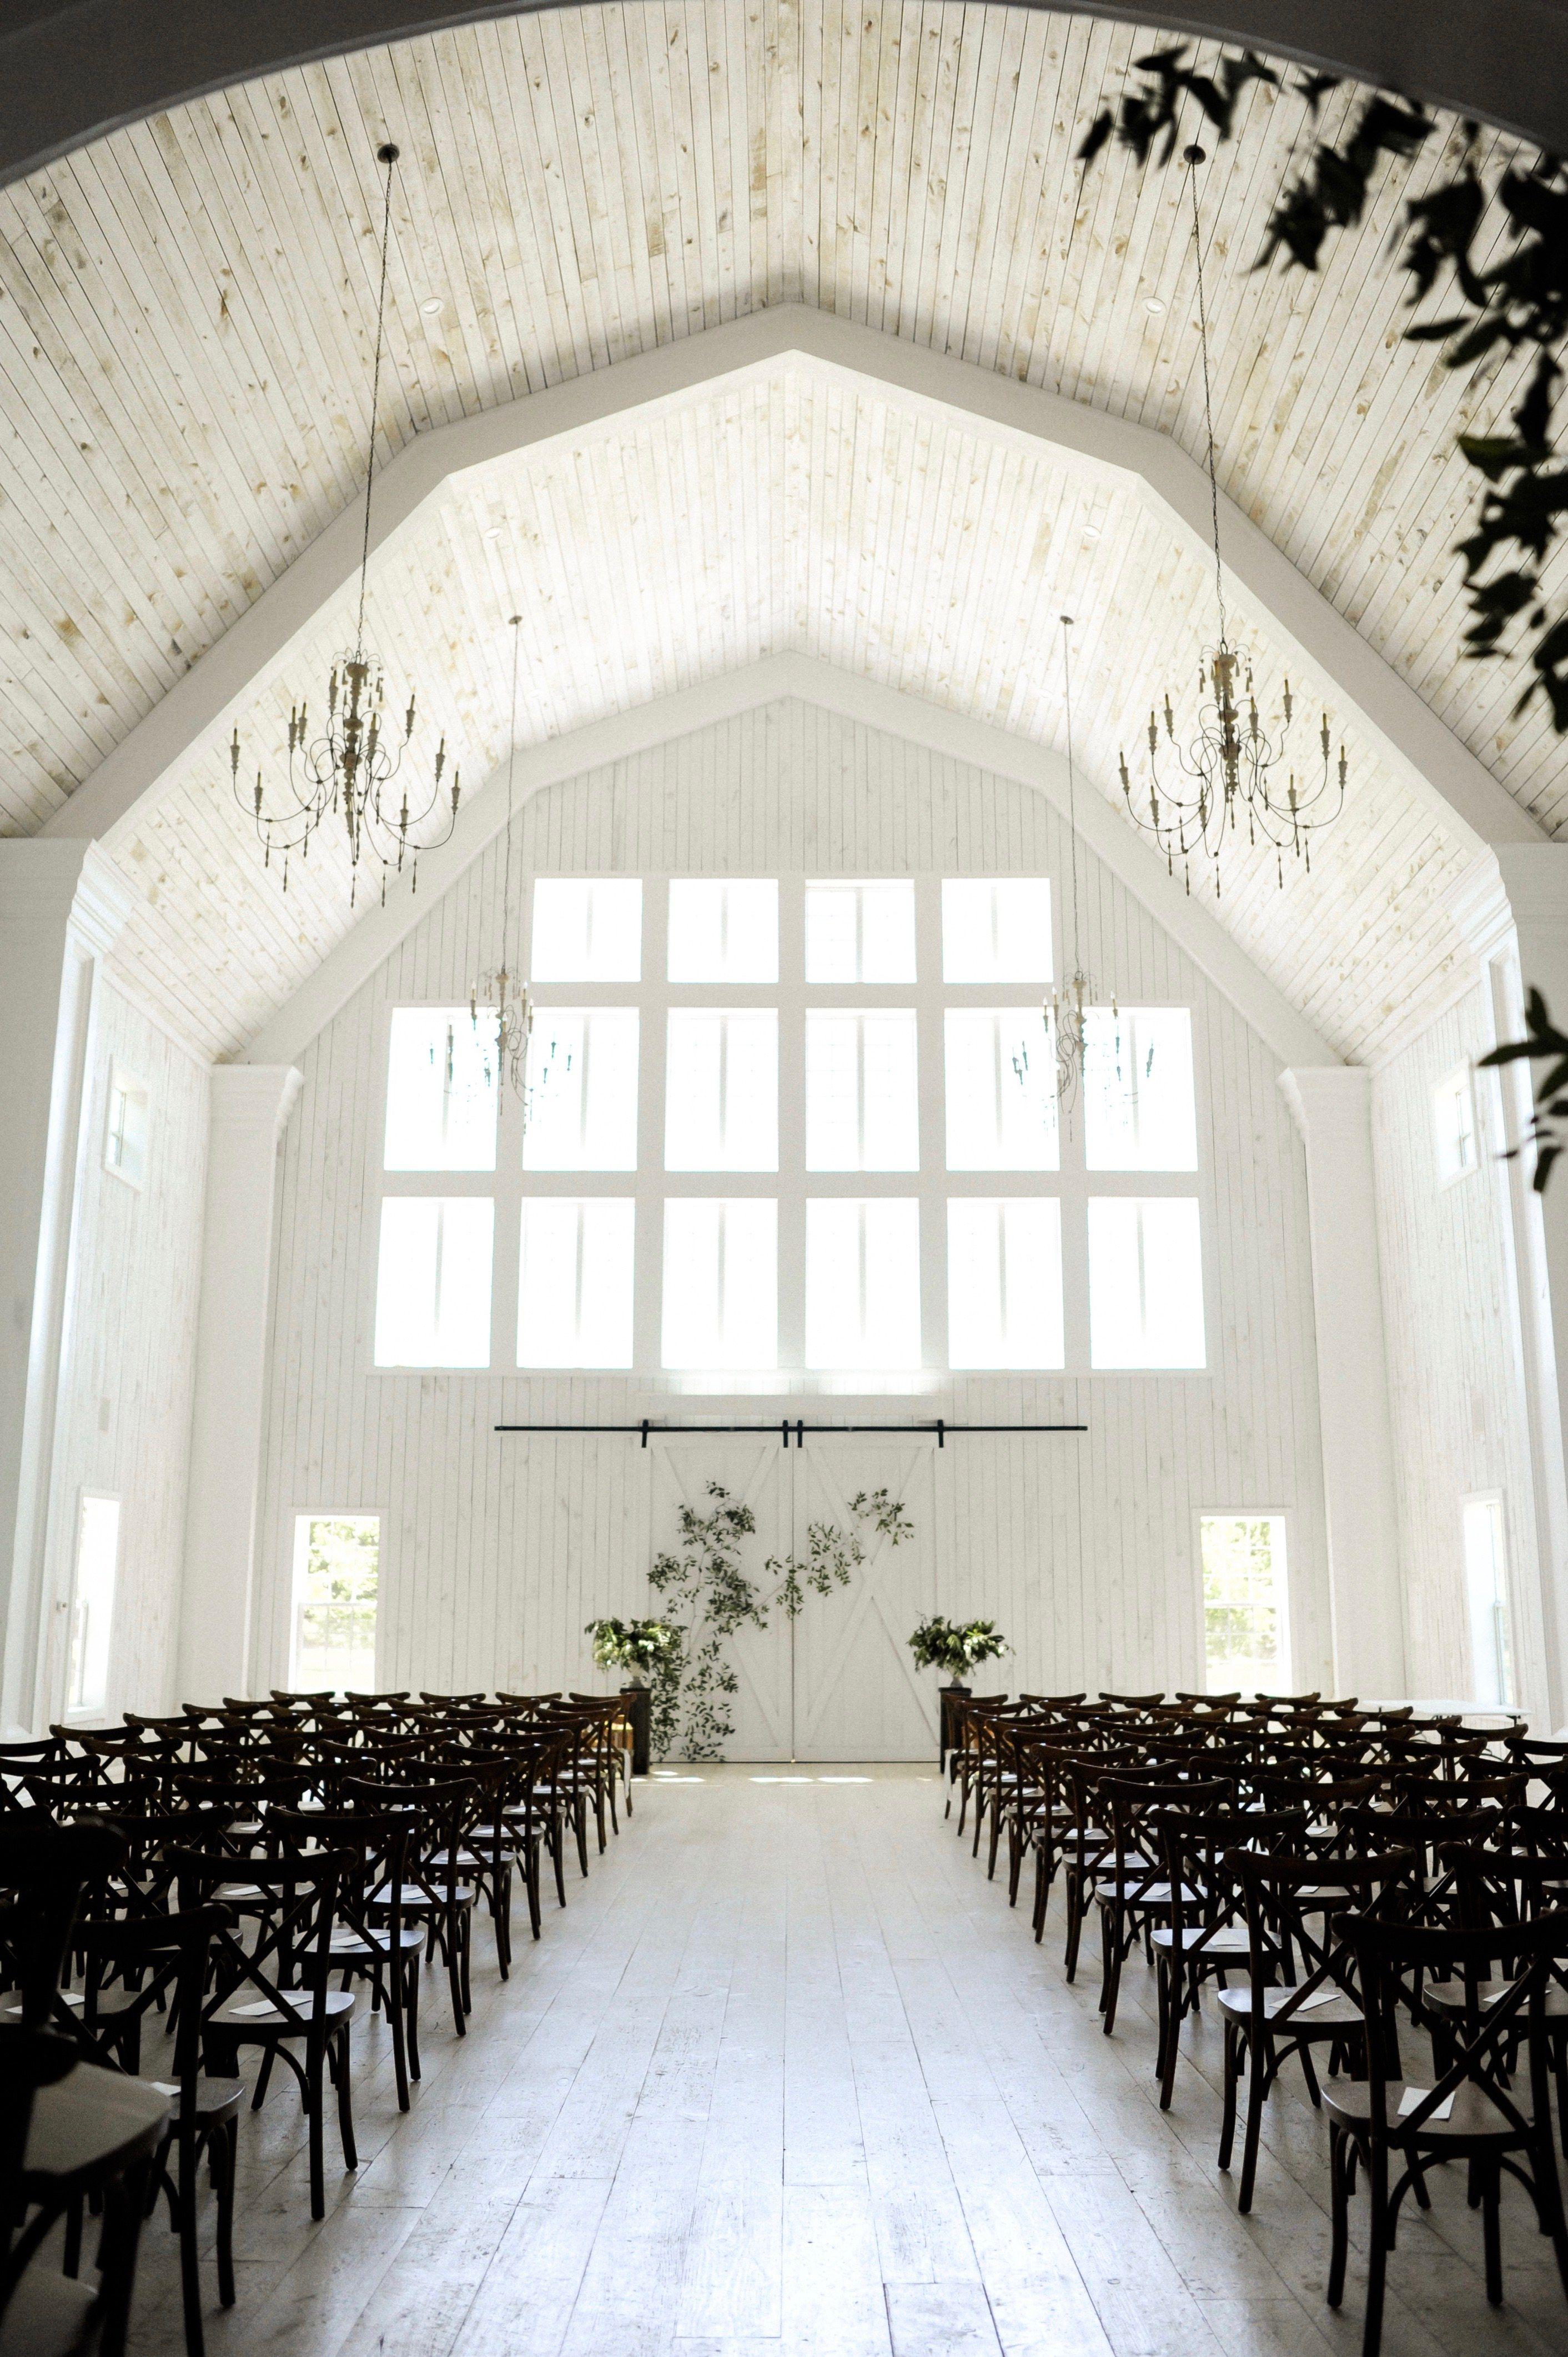 The Best Wedding Venues of 2017 Barn wedding venue, Best